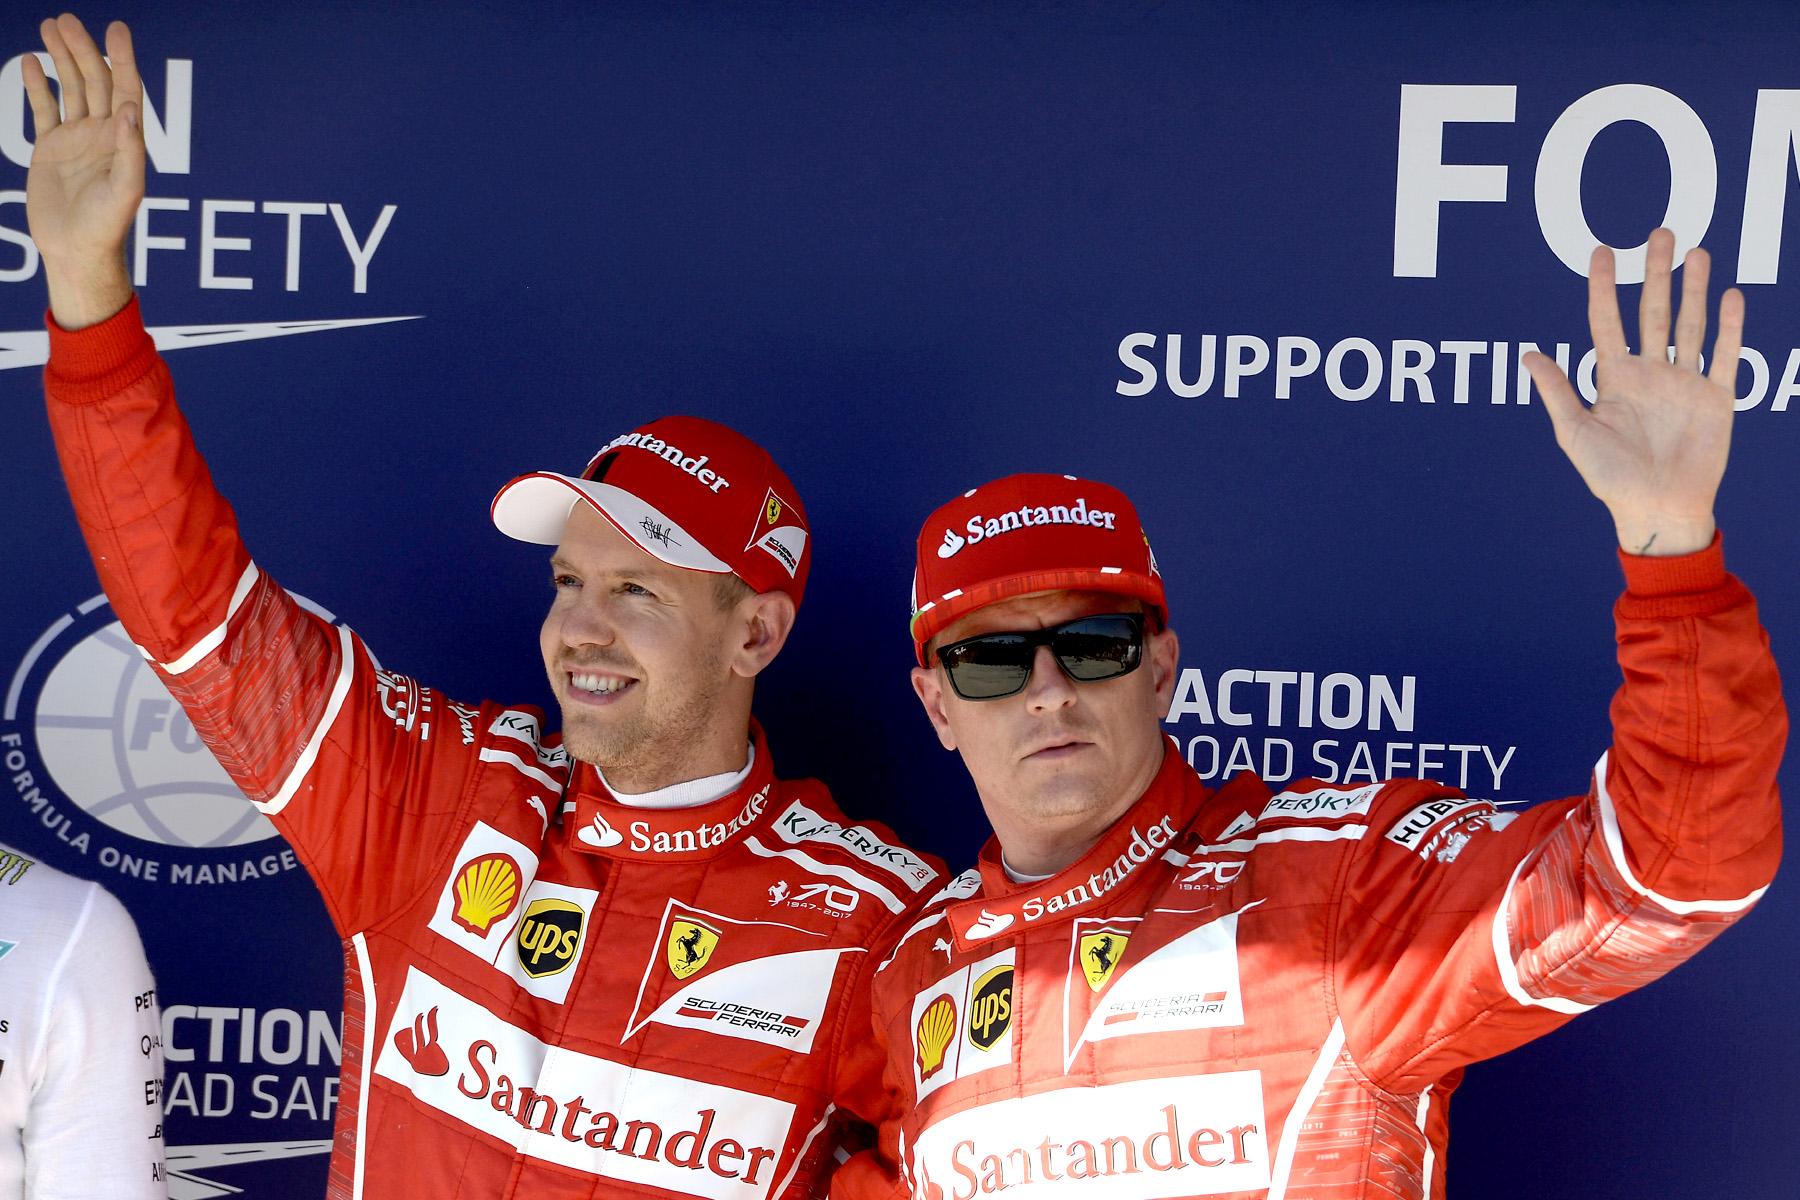 Sebastian Vettel and Kimi Raikkonen at the 2017 Hungarian Grand Prix.